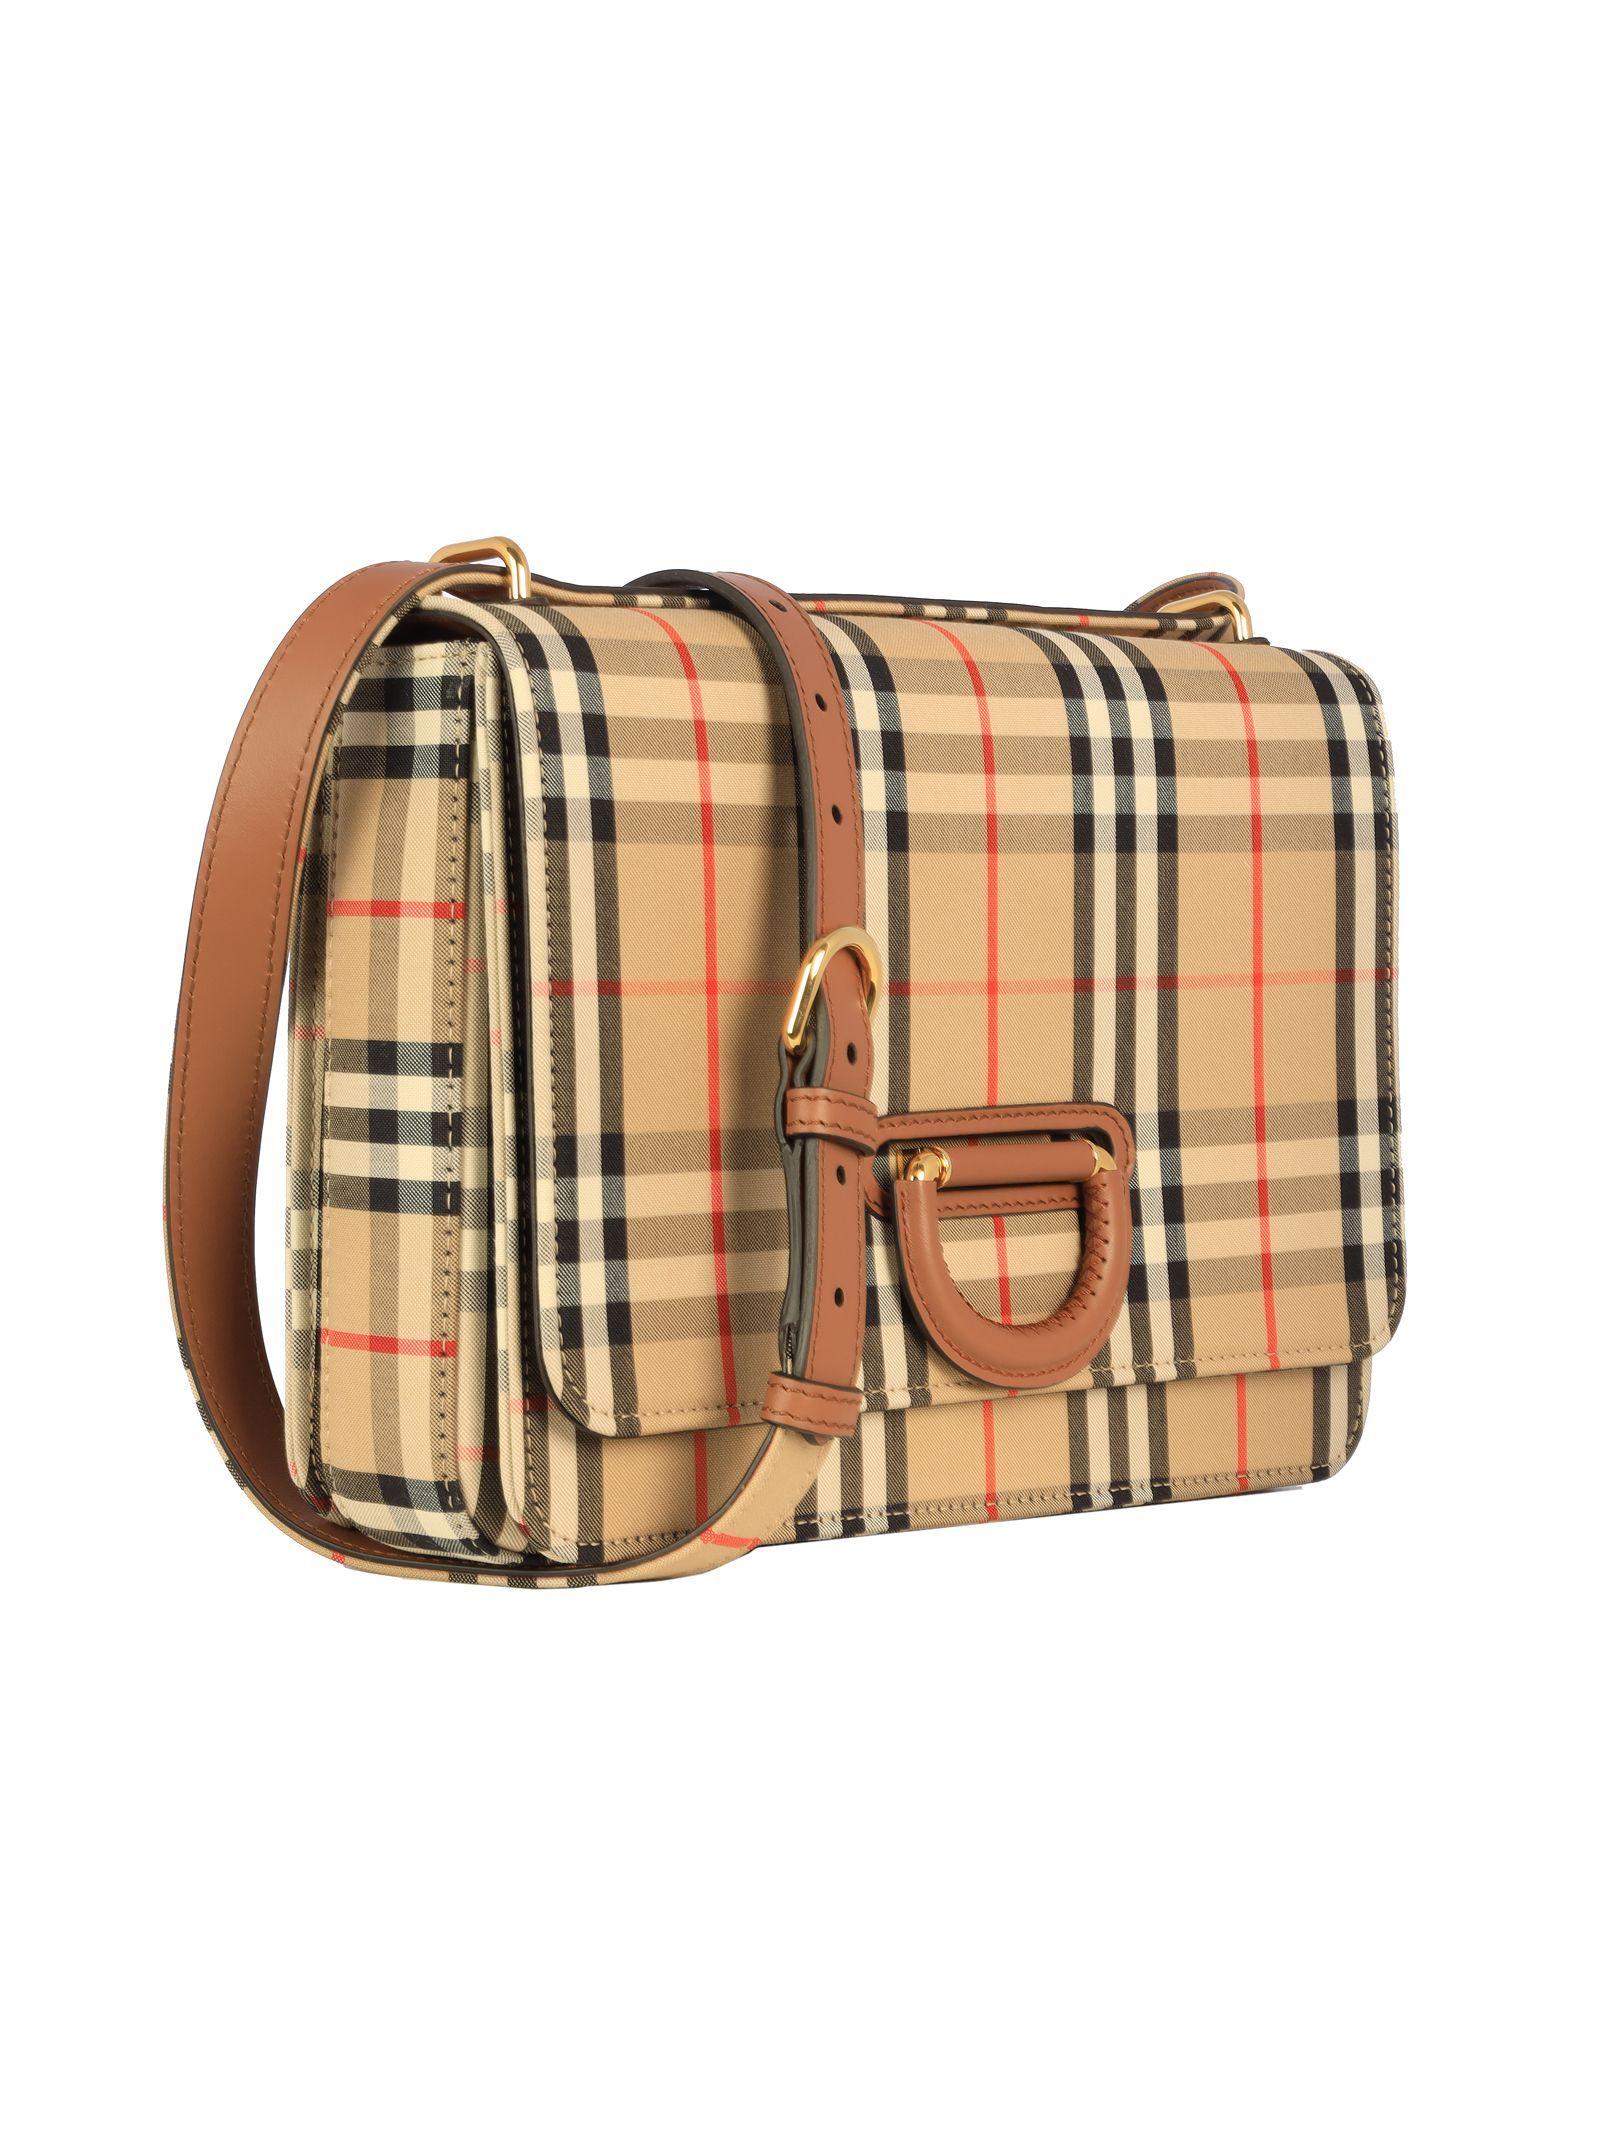 BURBERRY WOMEN'S 8021285 BEIGE LEATHER SHOULDER BAG